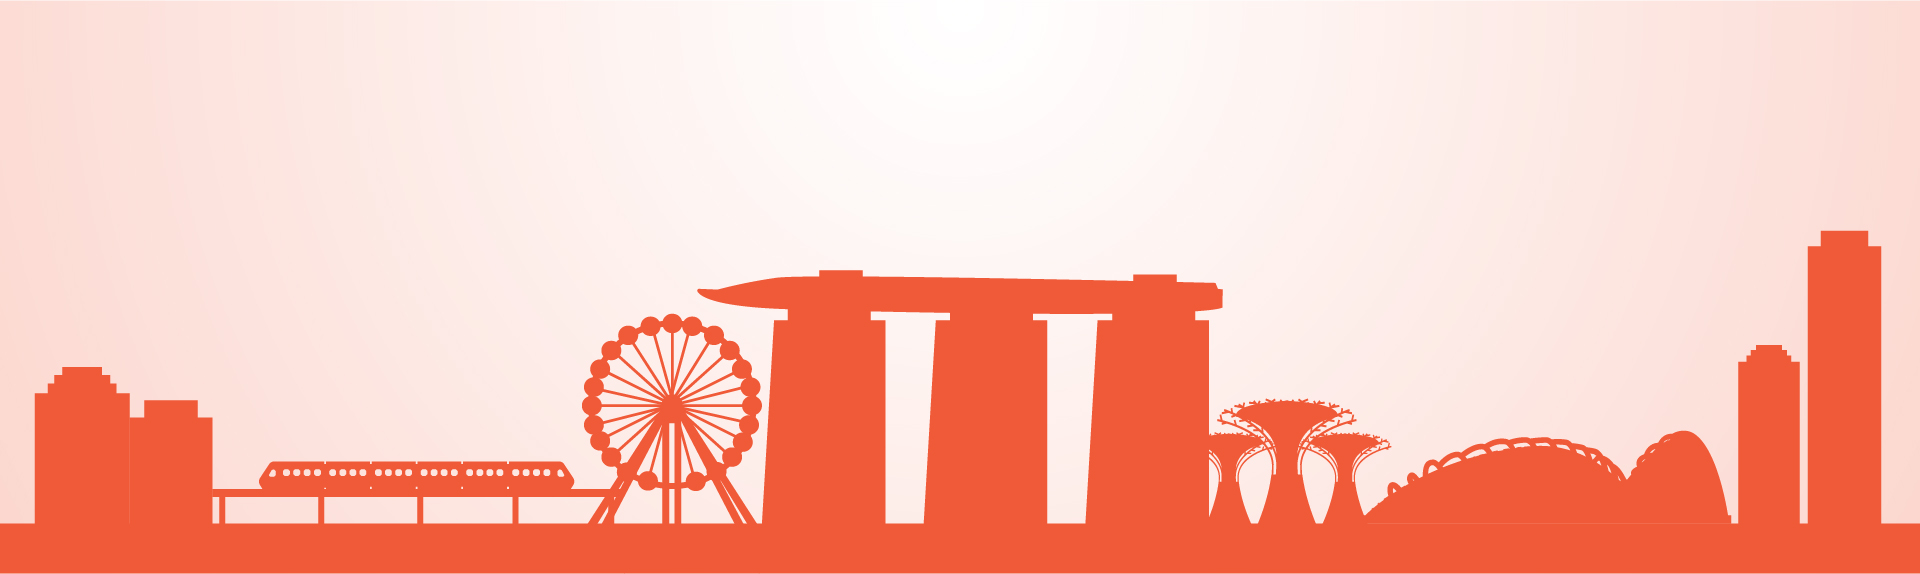 Singapore City Banner